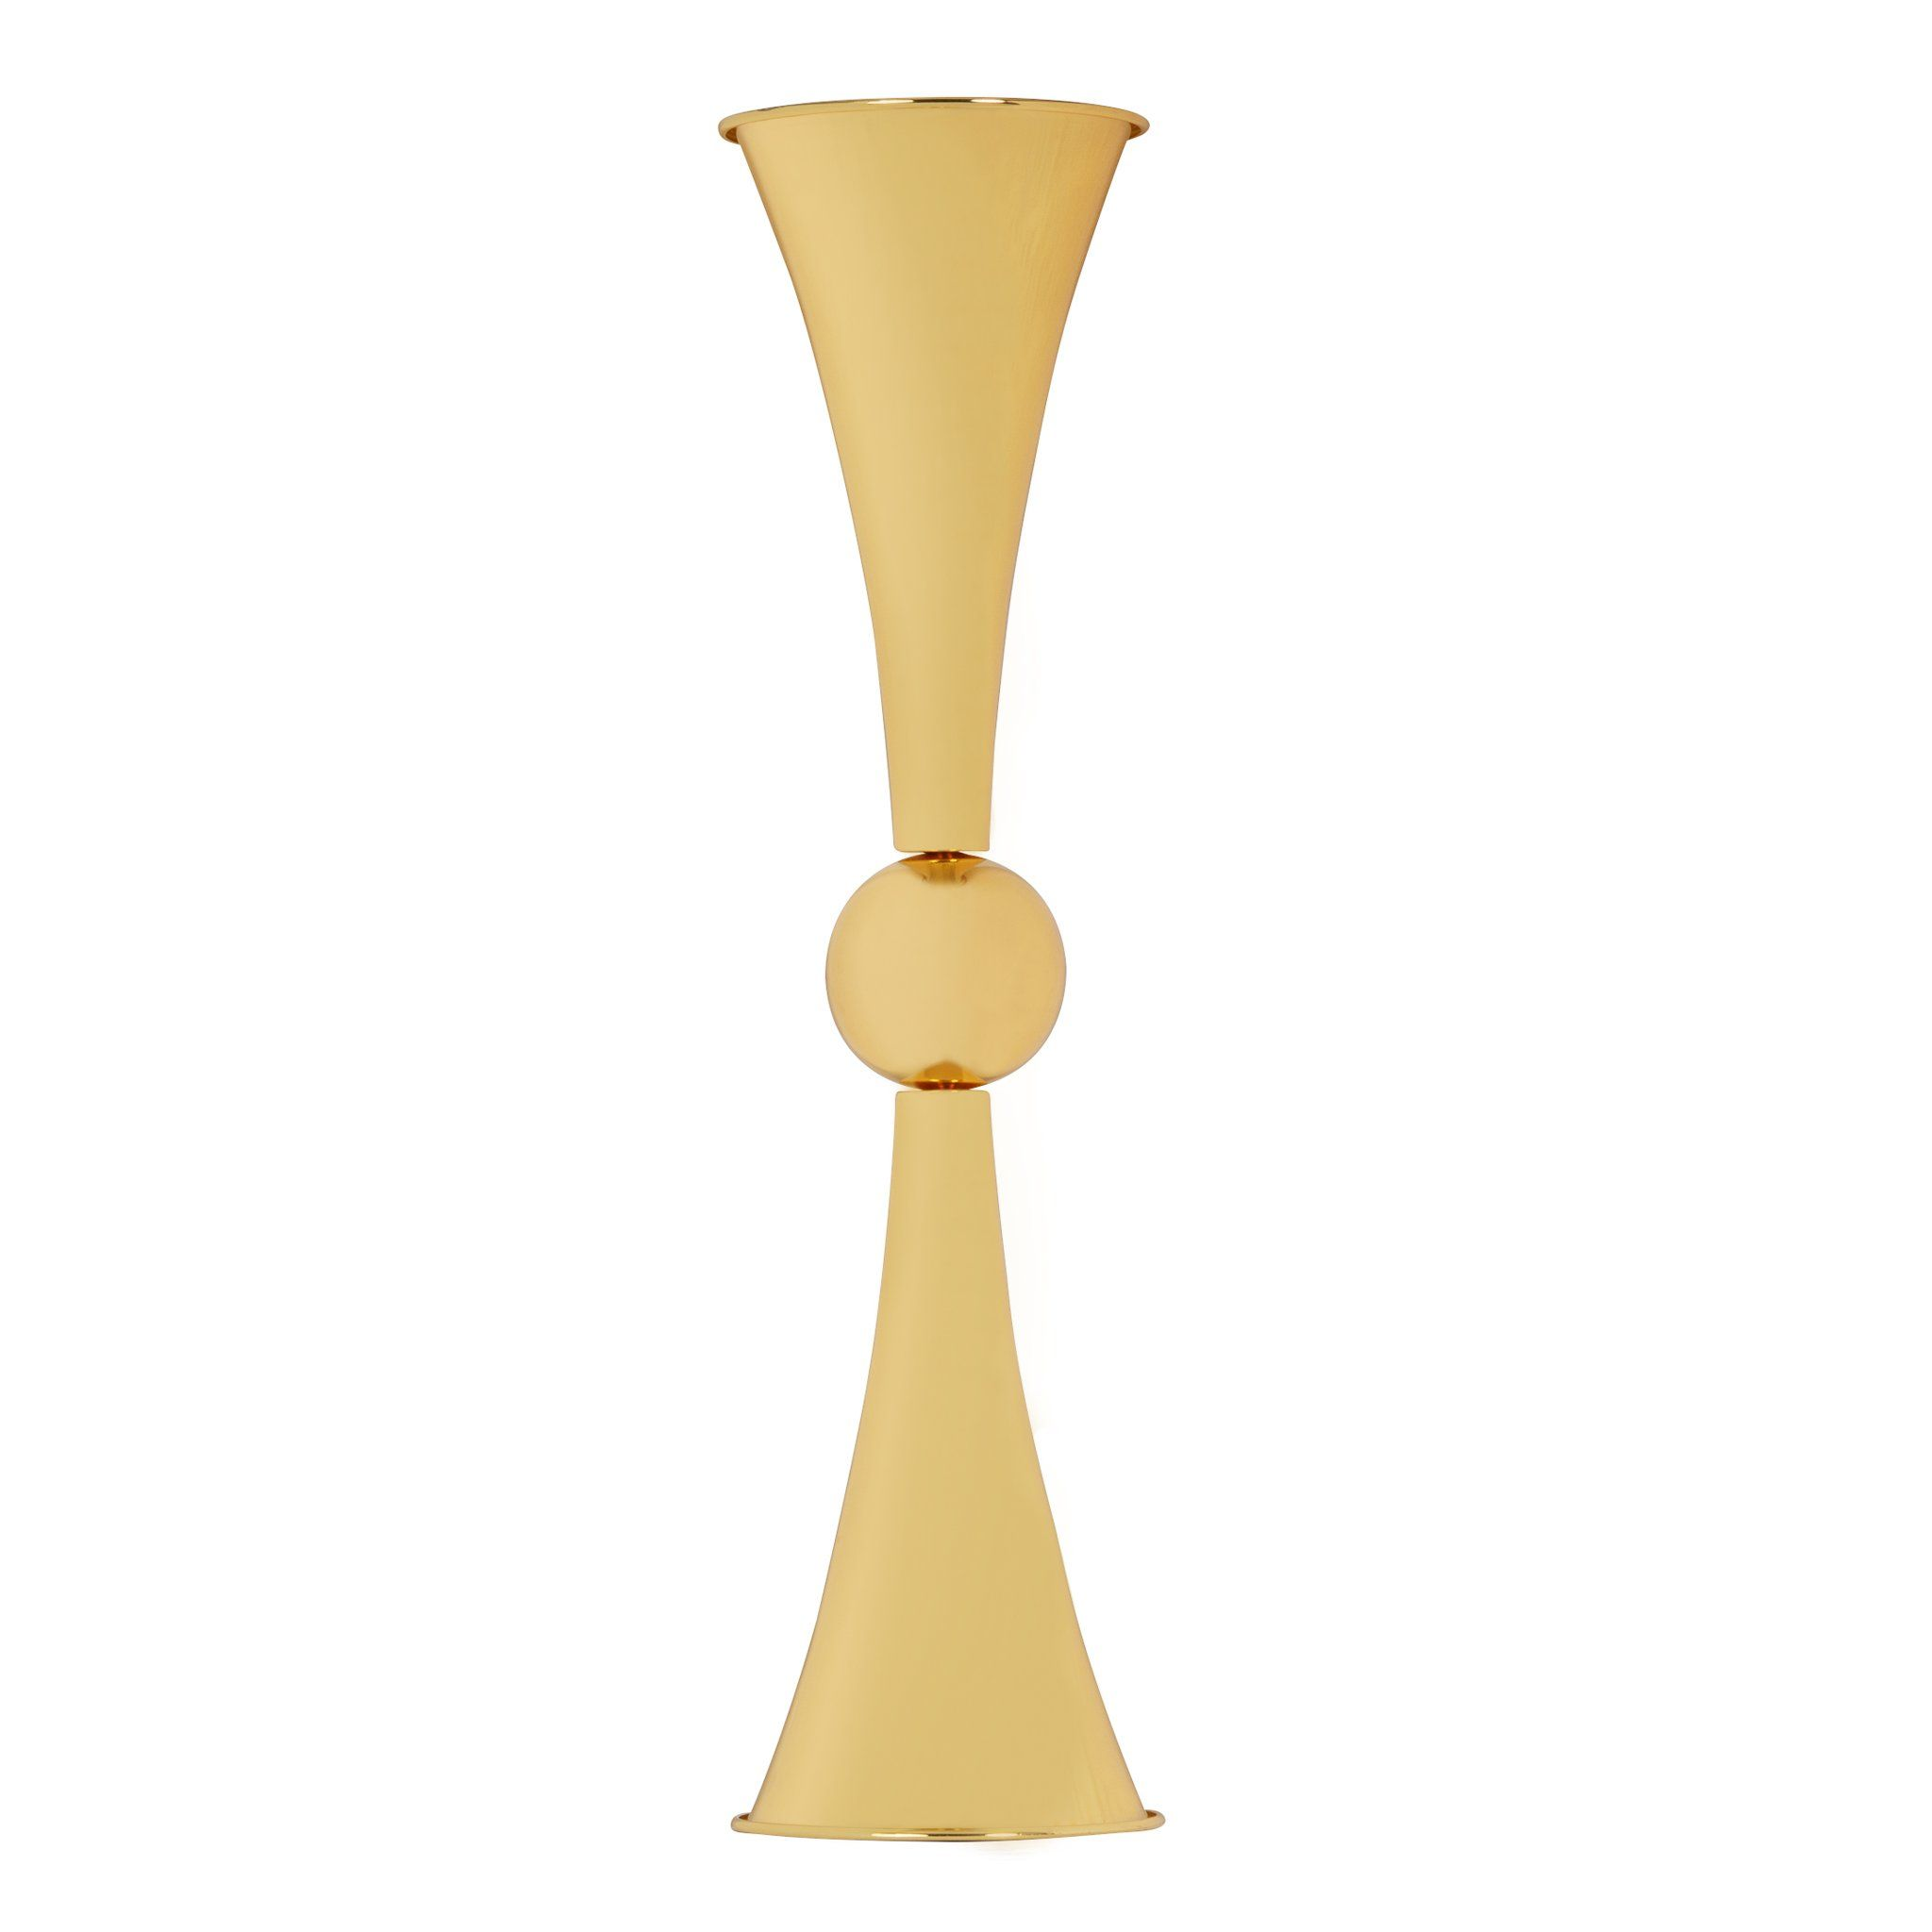 "Metallic Reversible Riser Flower Centerpiece Vase 28"" Tall - Gold"